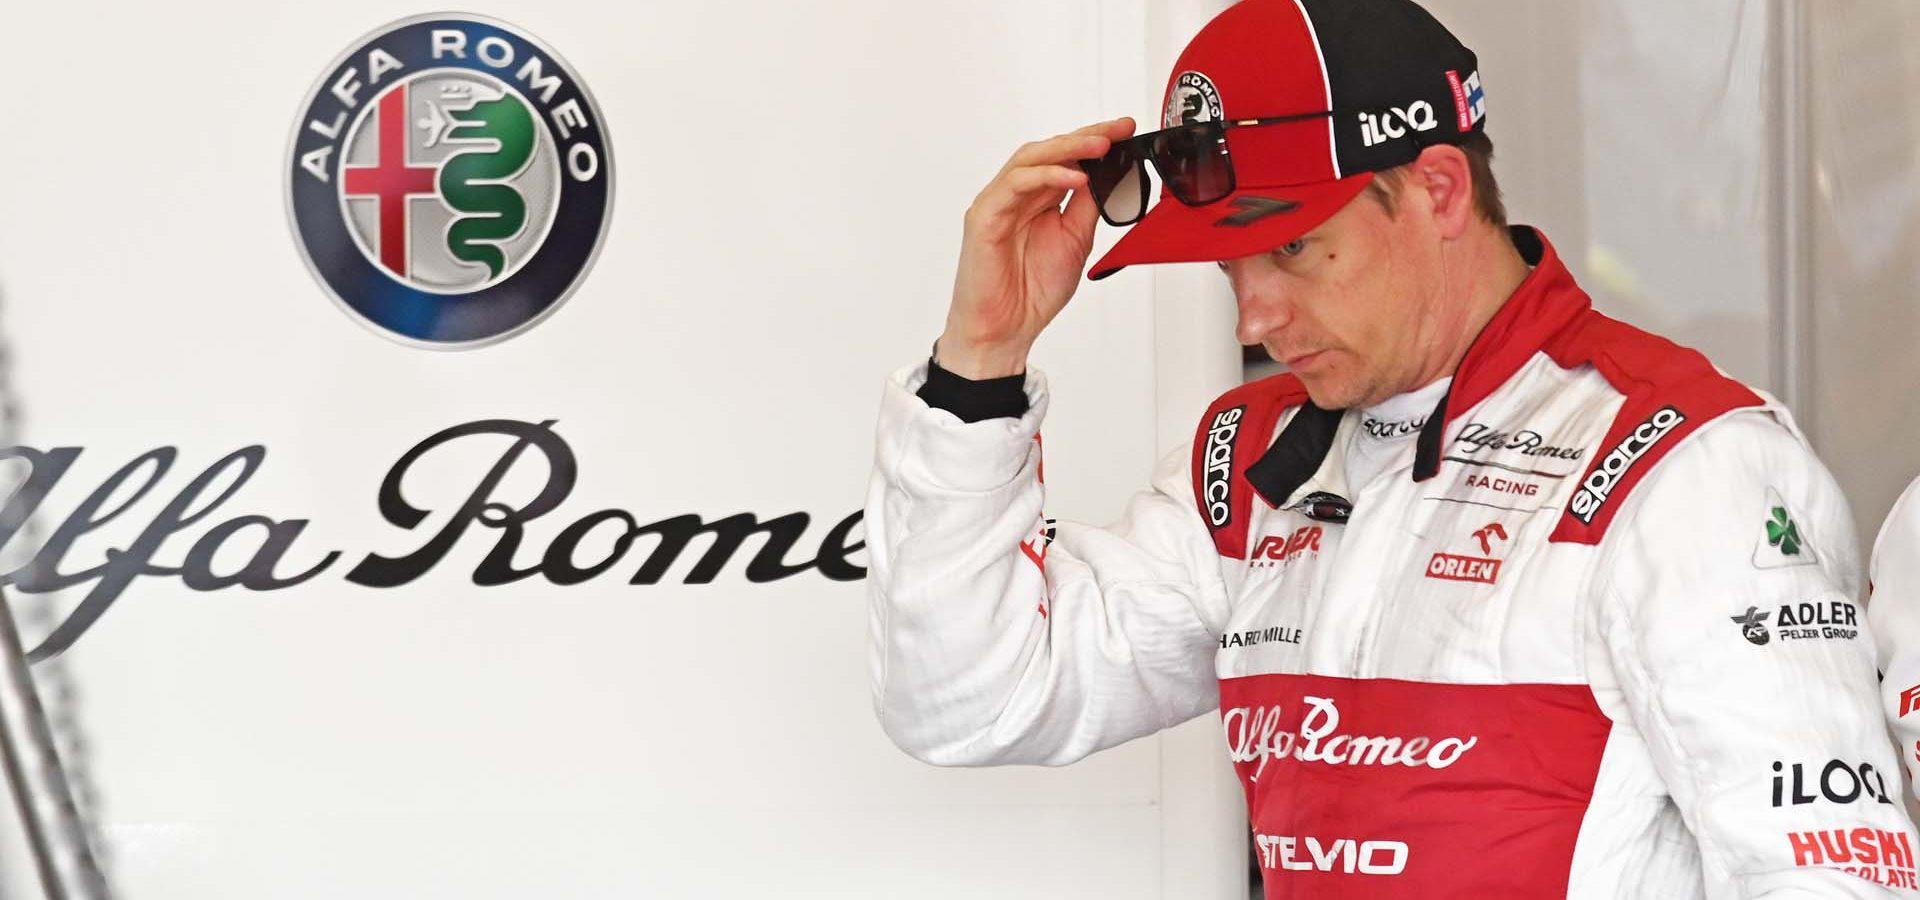 RAIKKONEN Kimi Räikkönen (fin), Alfa Romeo Racing C39, portrait  during the second session of the Formula 1 Pre-season testing 2020 from February 26 to 28, 2020 on the Circuit de Barcelona-Catalunya, in Montmelo, Barcelona, Spain - Photo Eric Vargiolu / DPPI